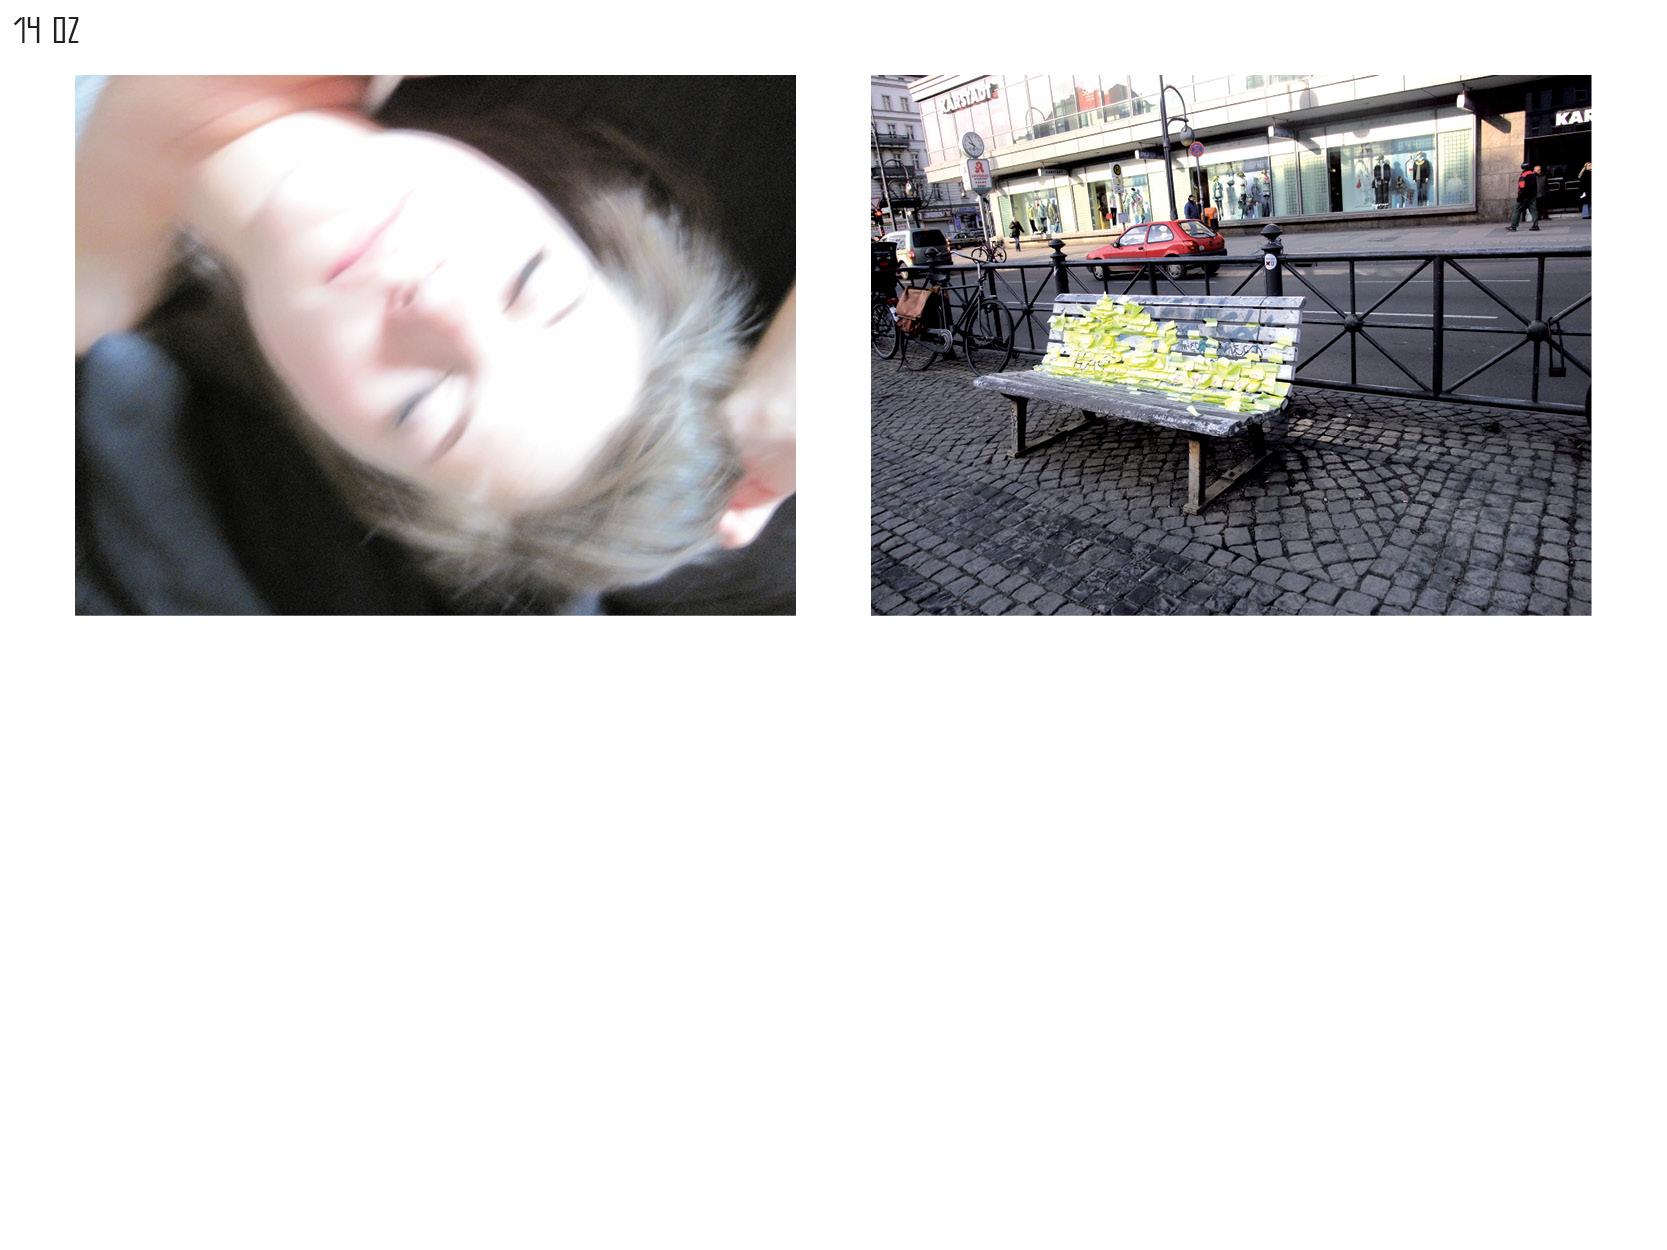 Gerrit-Schweiger-Dialog-Städte-Paris-Berlin-Jessica-Blank-Experiment-Fotoserie-Tagebuch-visuelle-Kommunikation-102